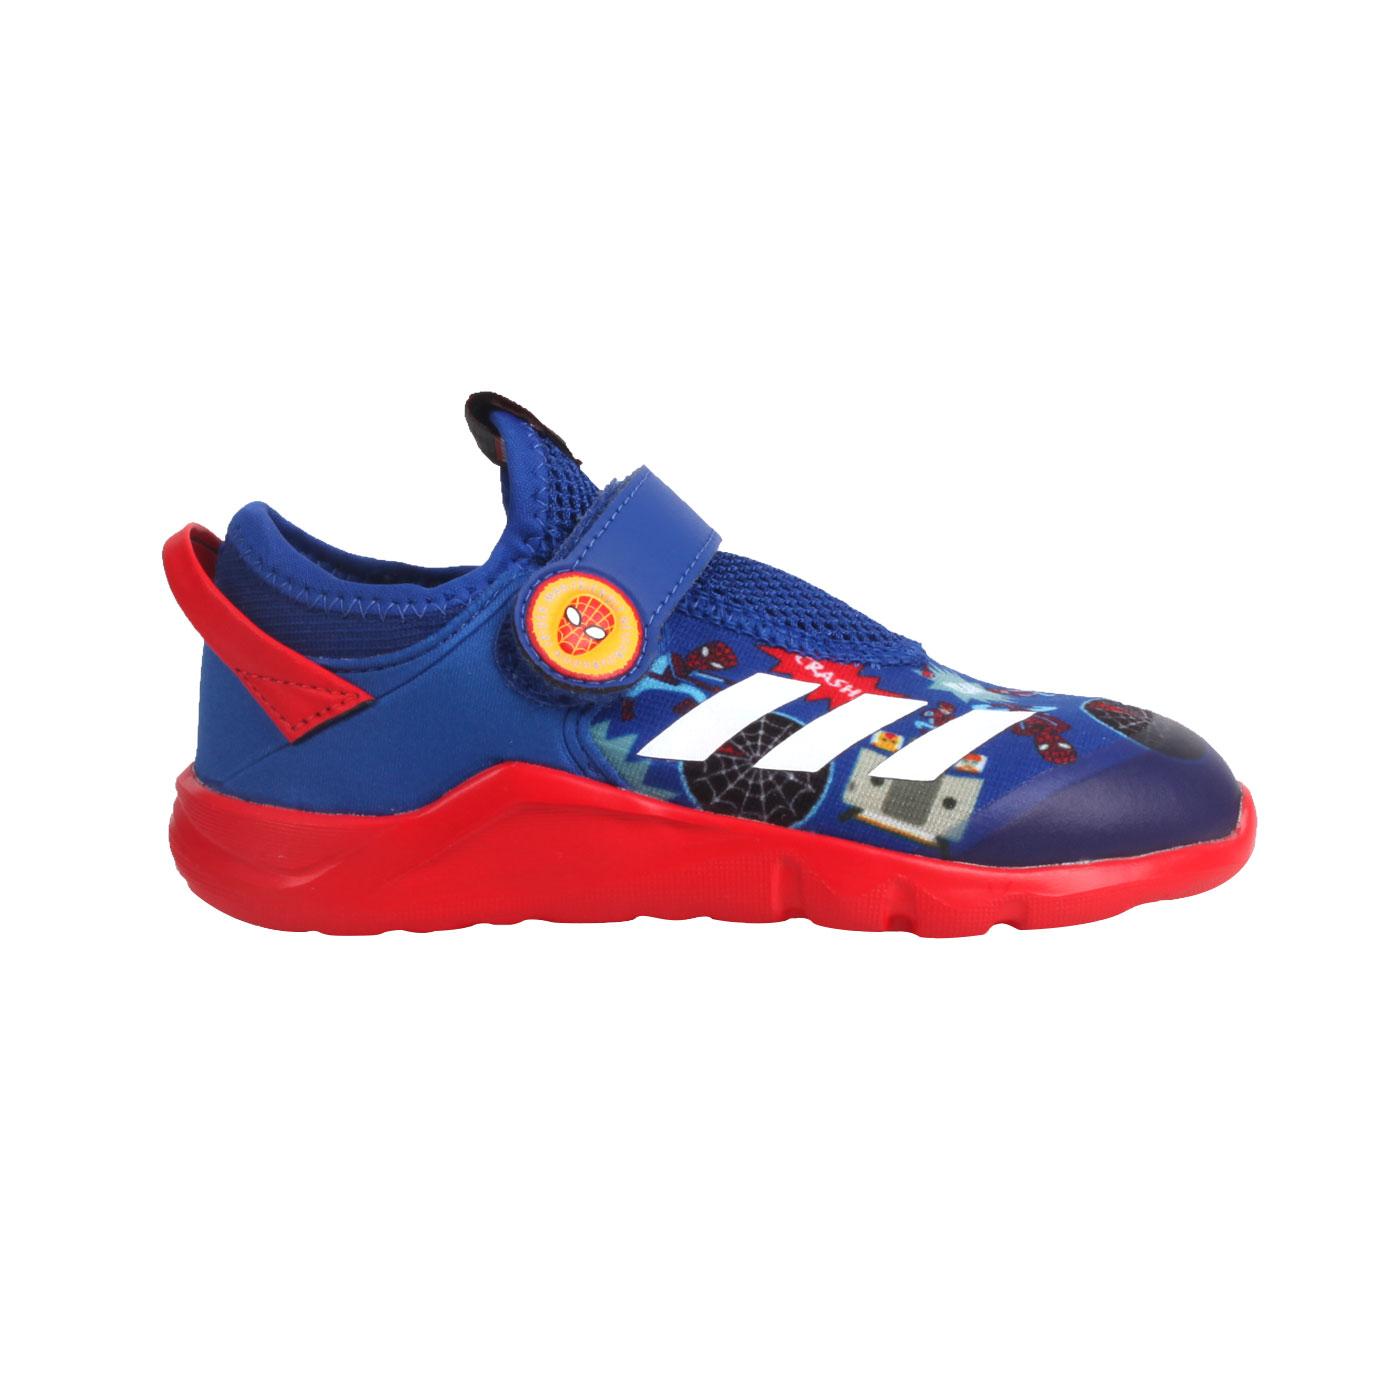 ADIDAS 小童休閒運動鞋  @ActiveFlex Spider-M AC I@FV4265 - 藍紅白